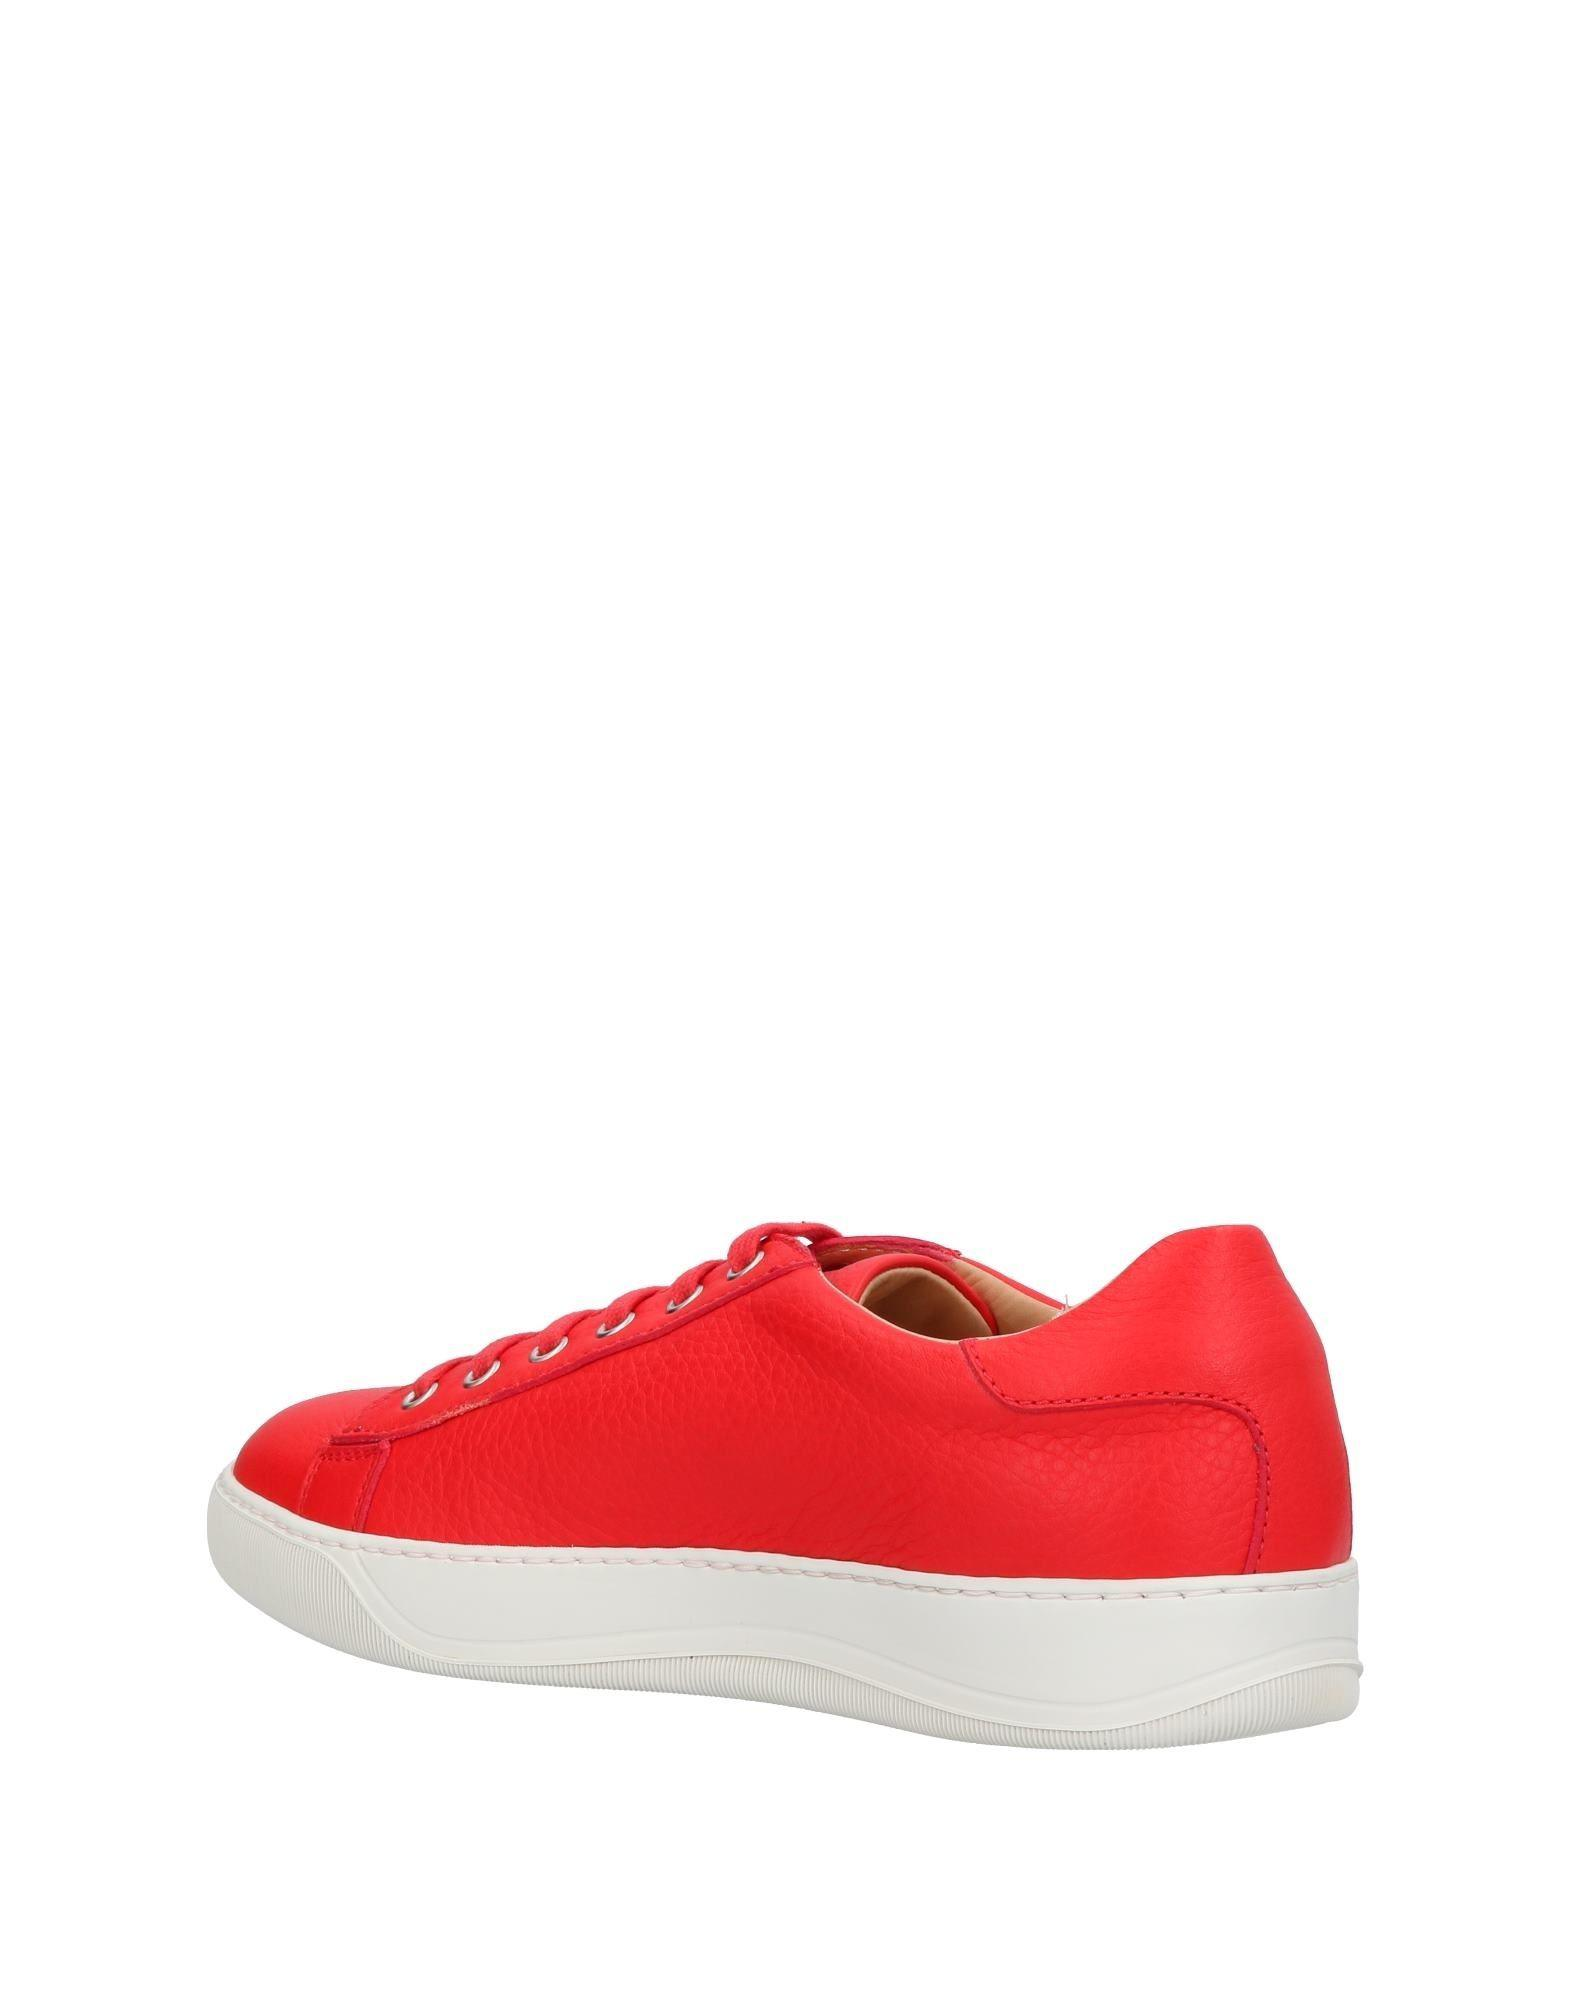 reputable site b9567 93dba santoni-Red-Low-tops-Sneakers.jpeg